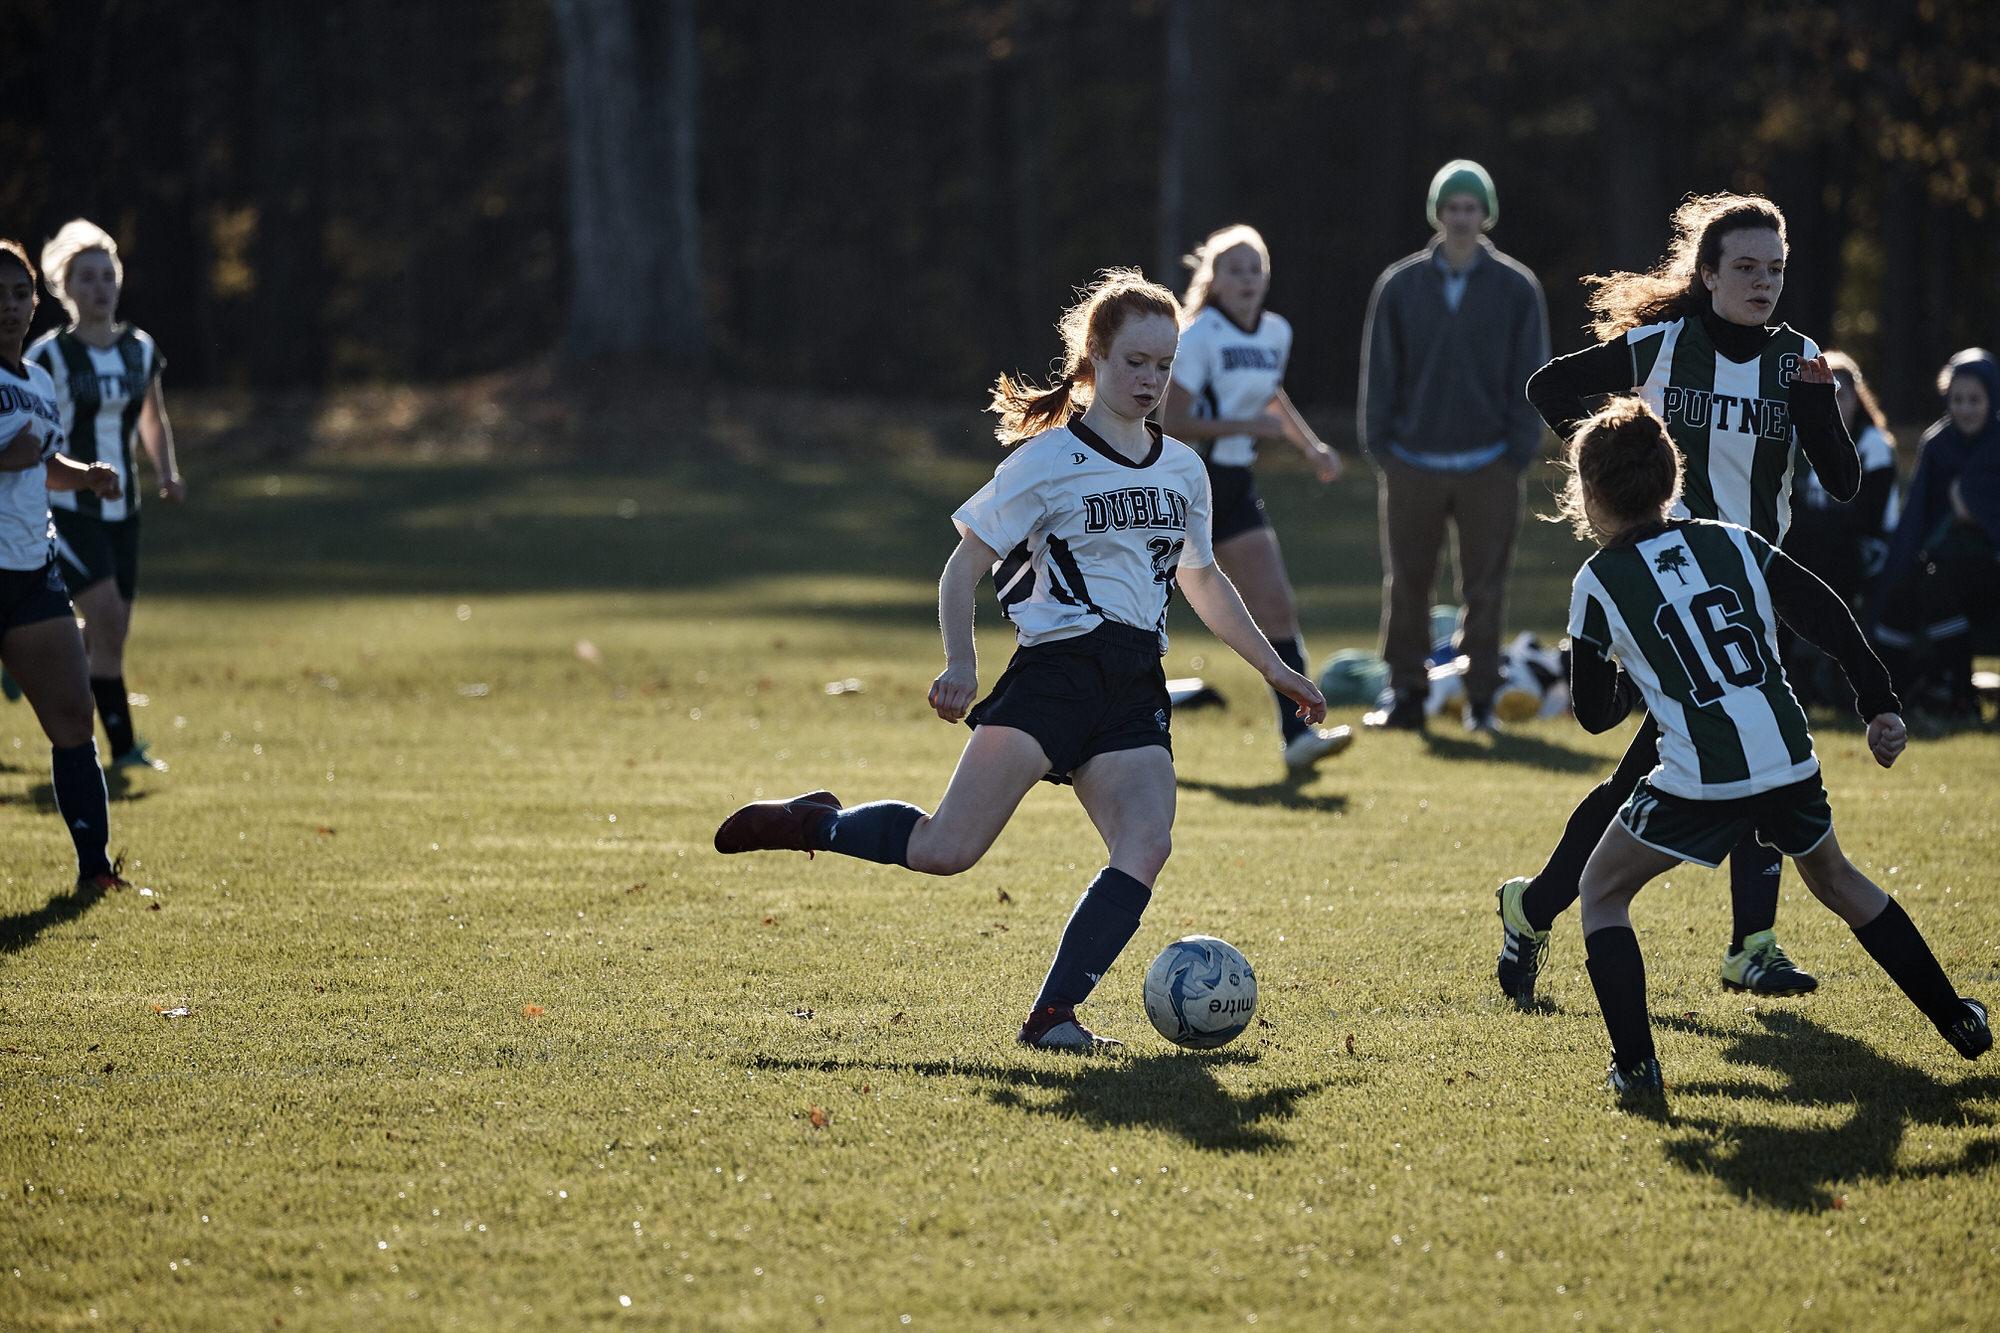 Girls Varsity Soccer vs. Putney School - October 26, 2018 - 032.jpg